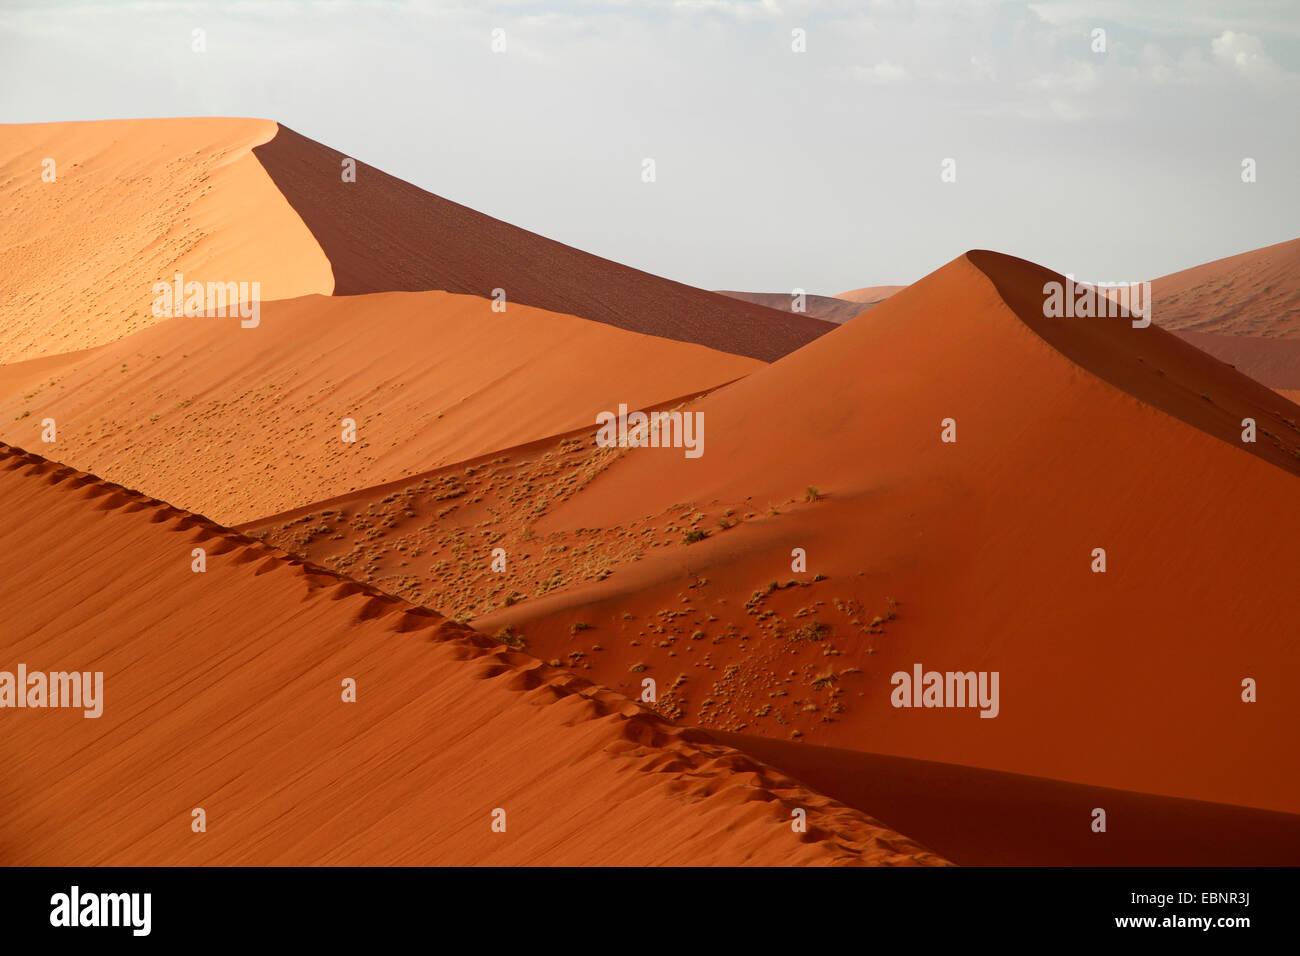 sand dunes of the namib dessert, Namibia, Namib Naukluft National Park, Sossusvlei - Stock Image